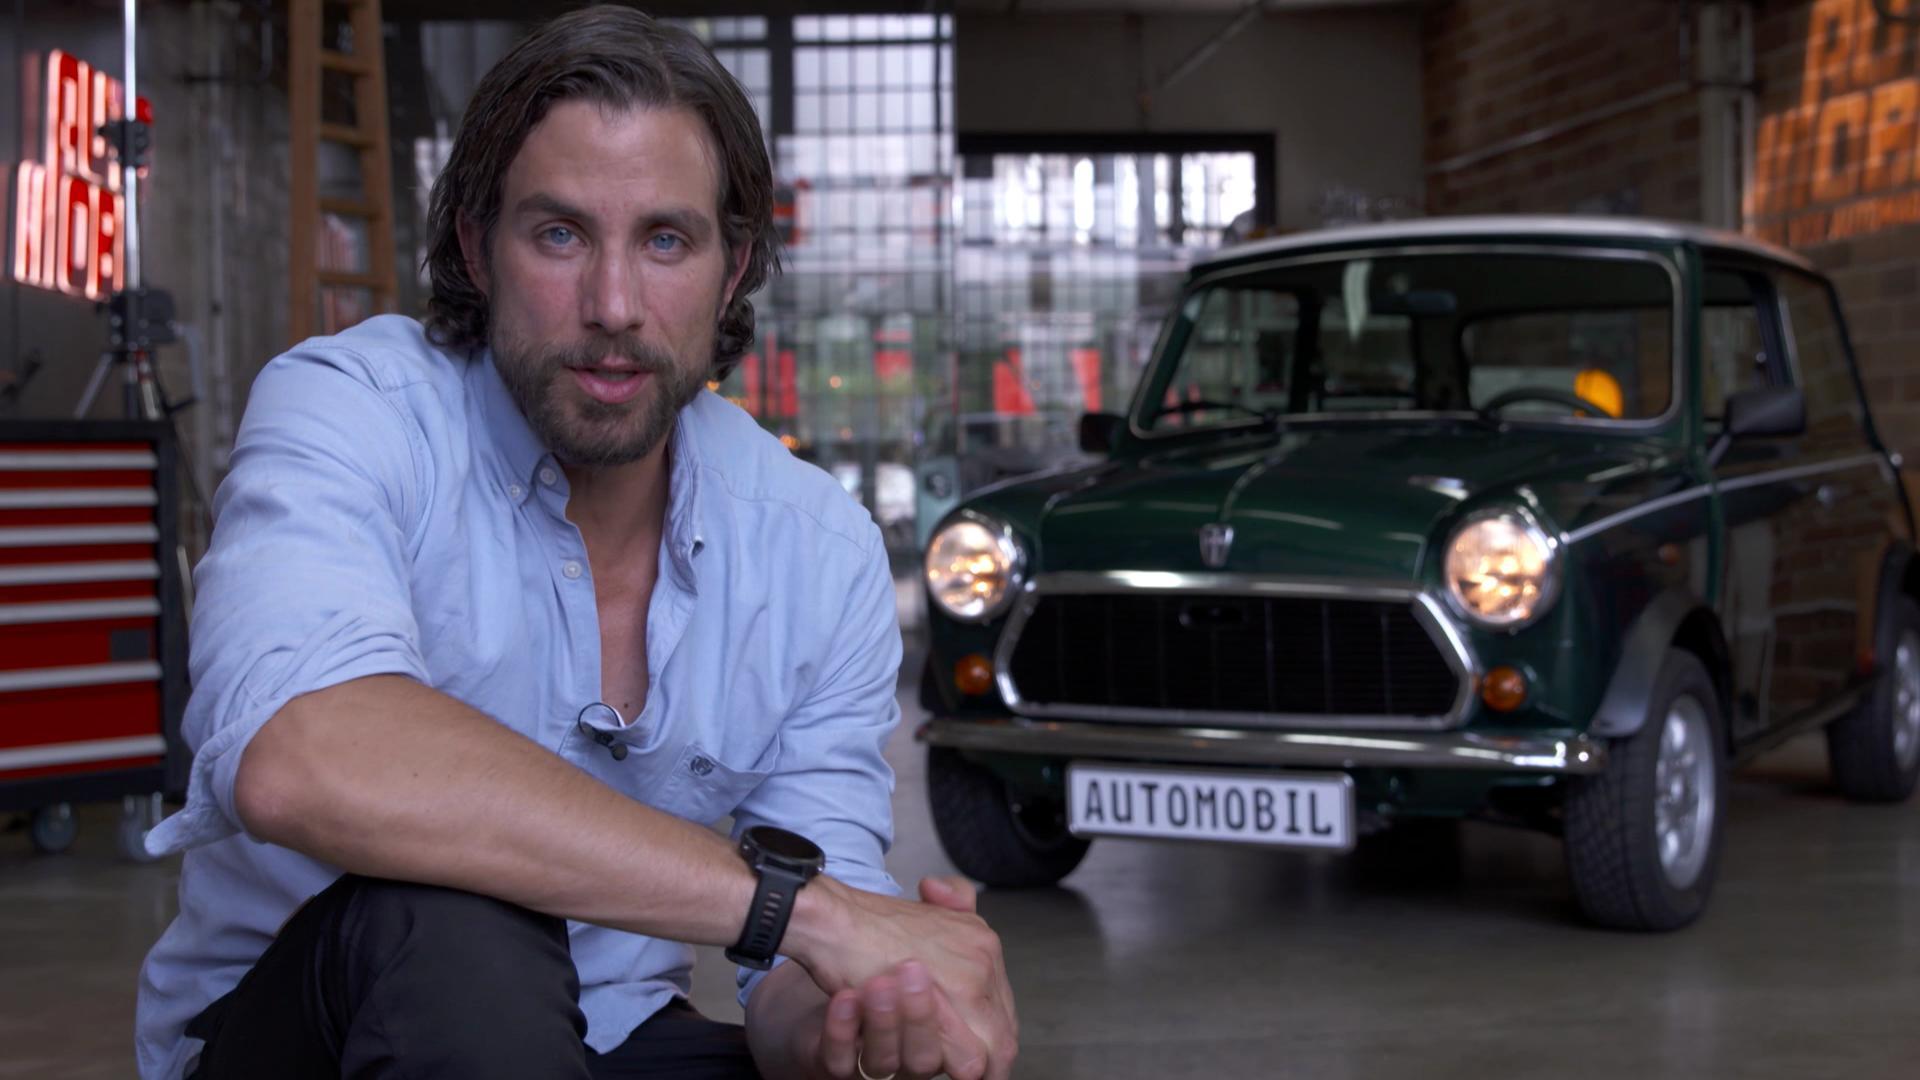 Vox Automagazin